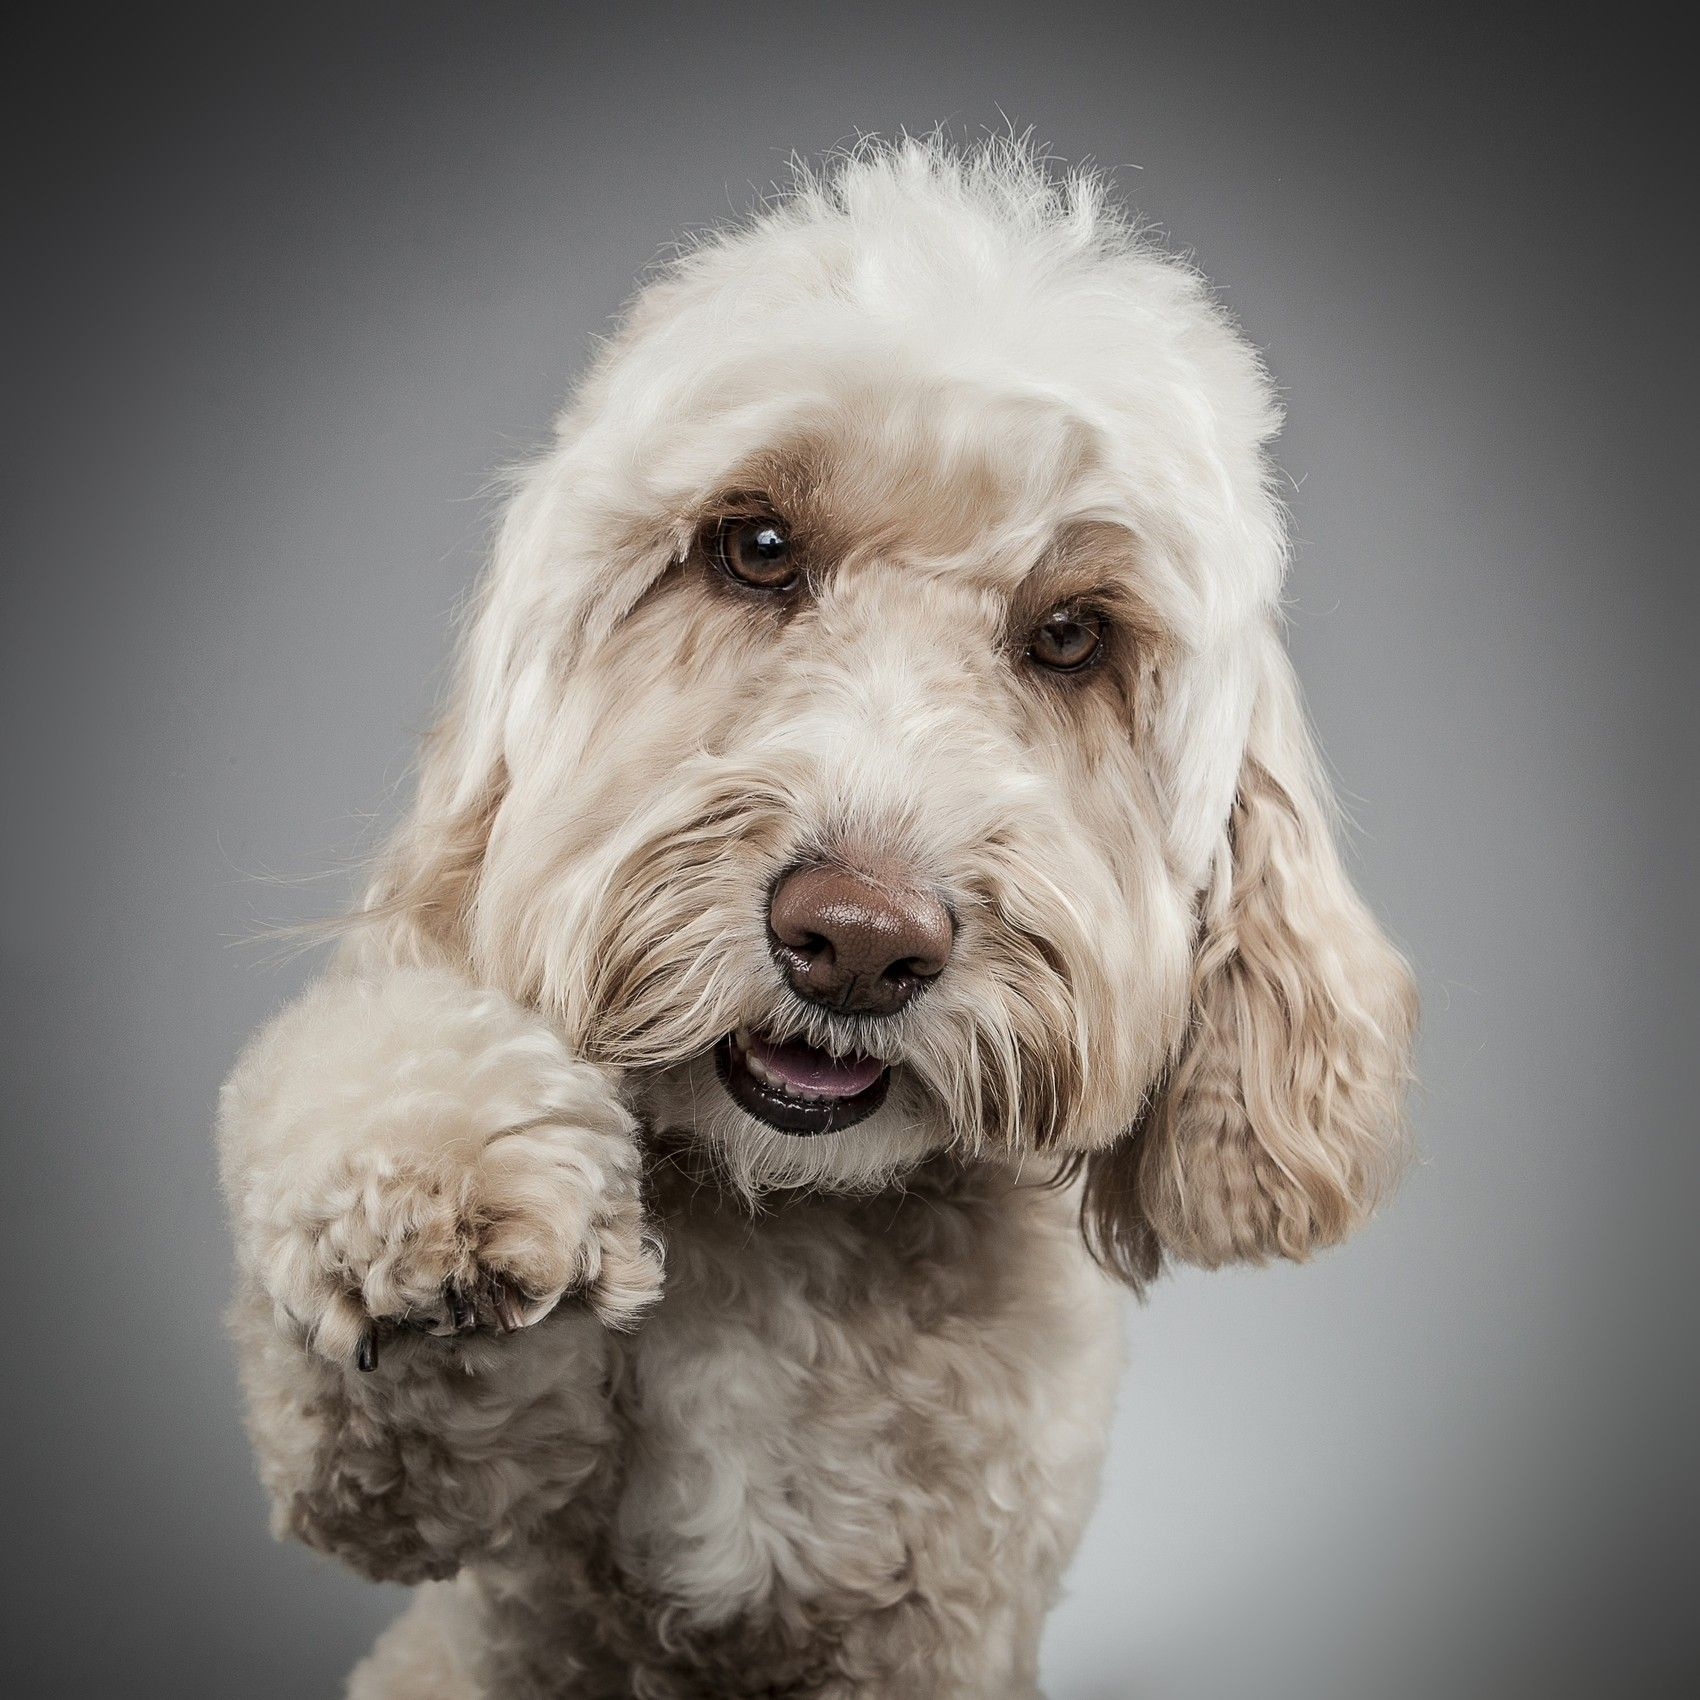 Pet Dog Portrait Photography Dog Portrait Photography Dog